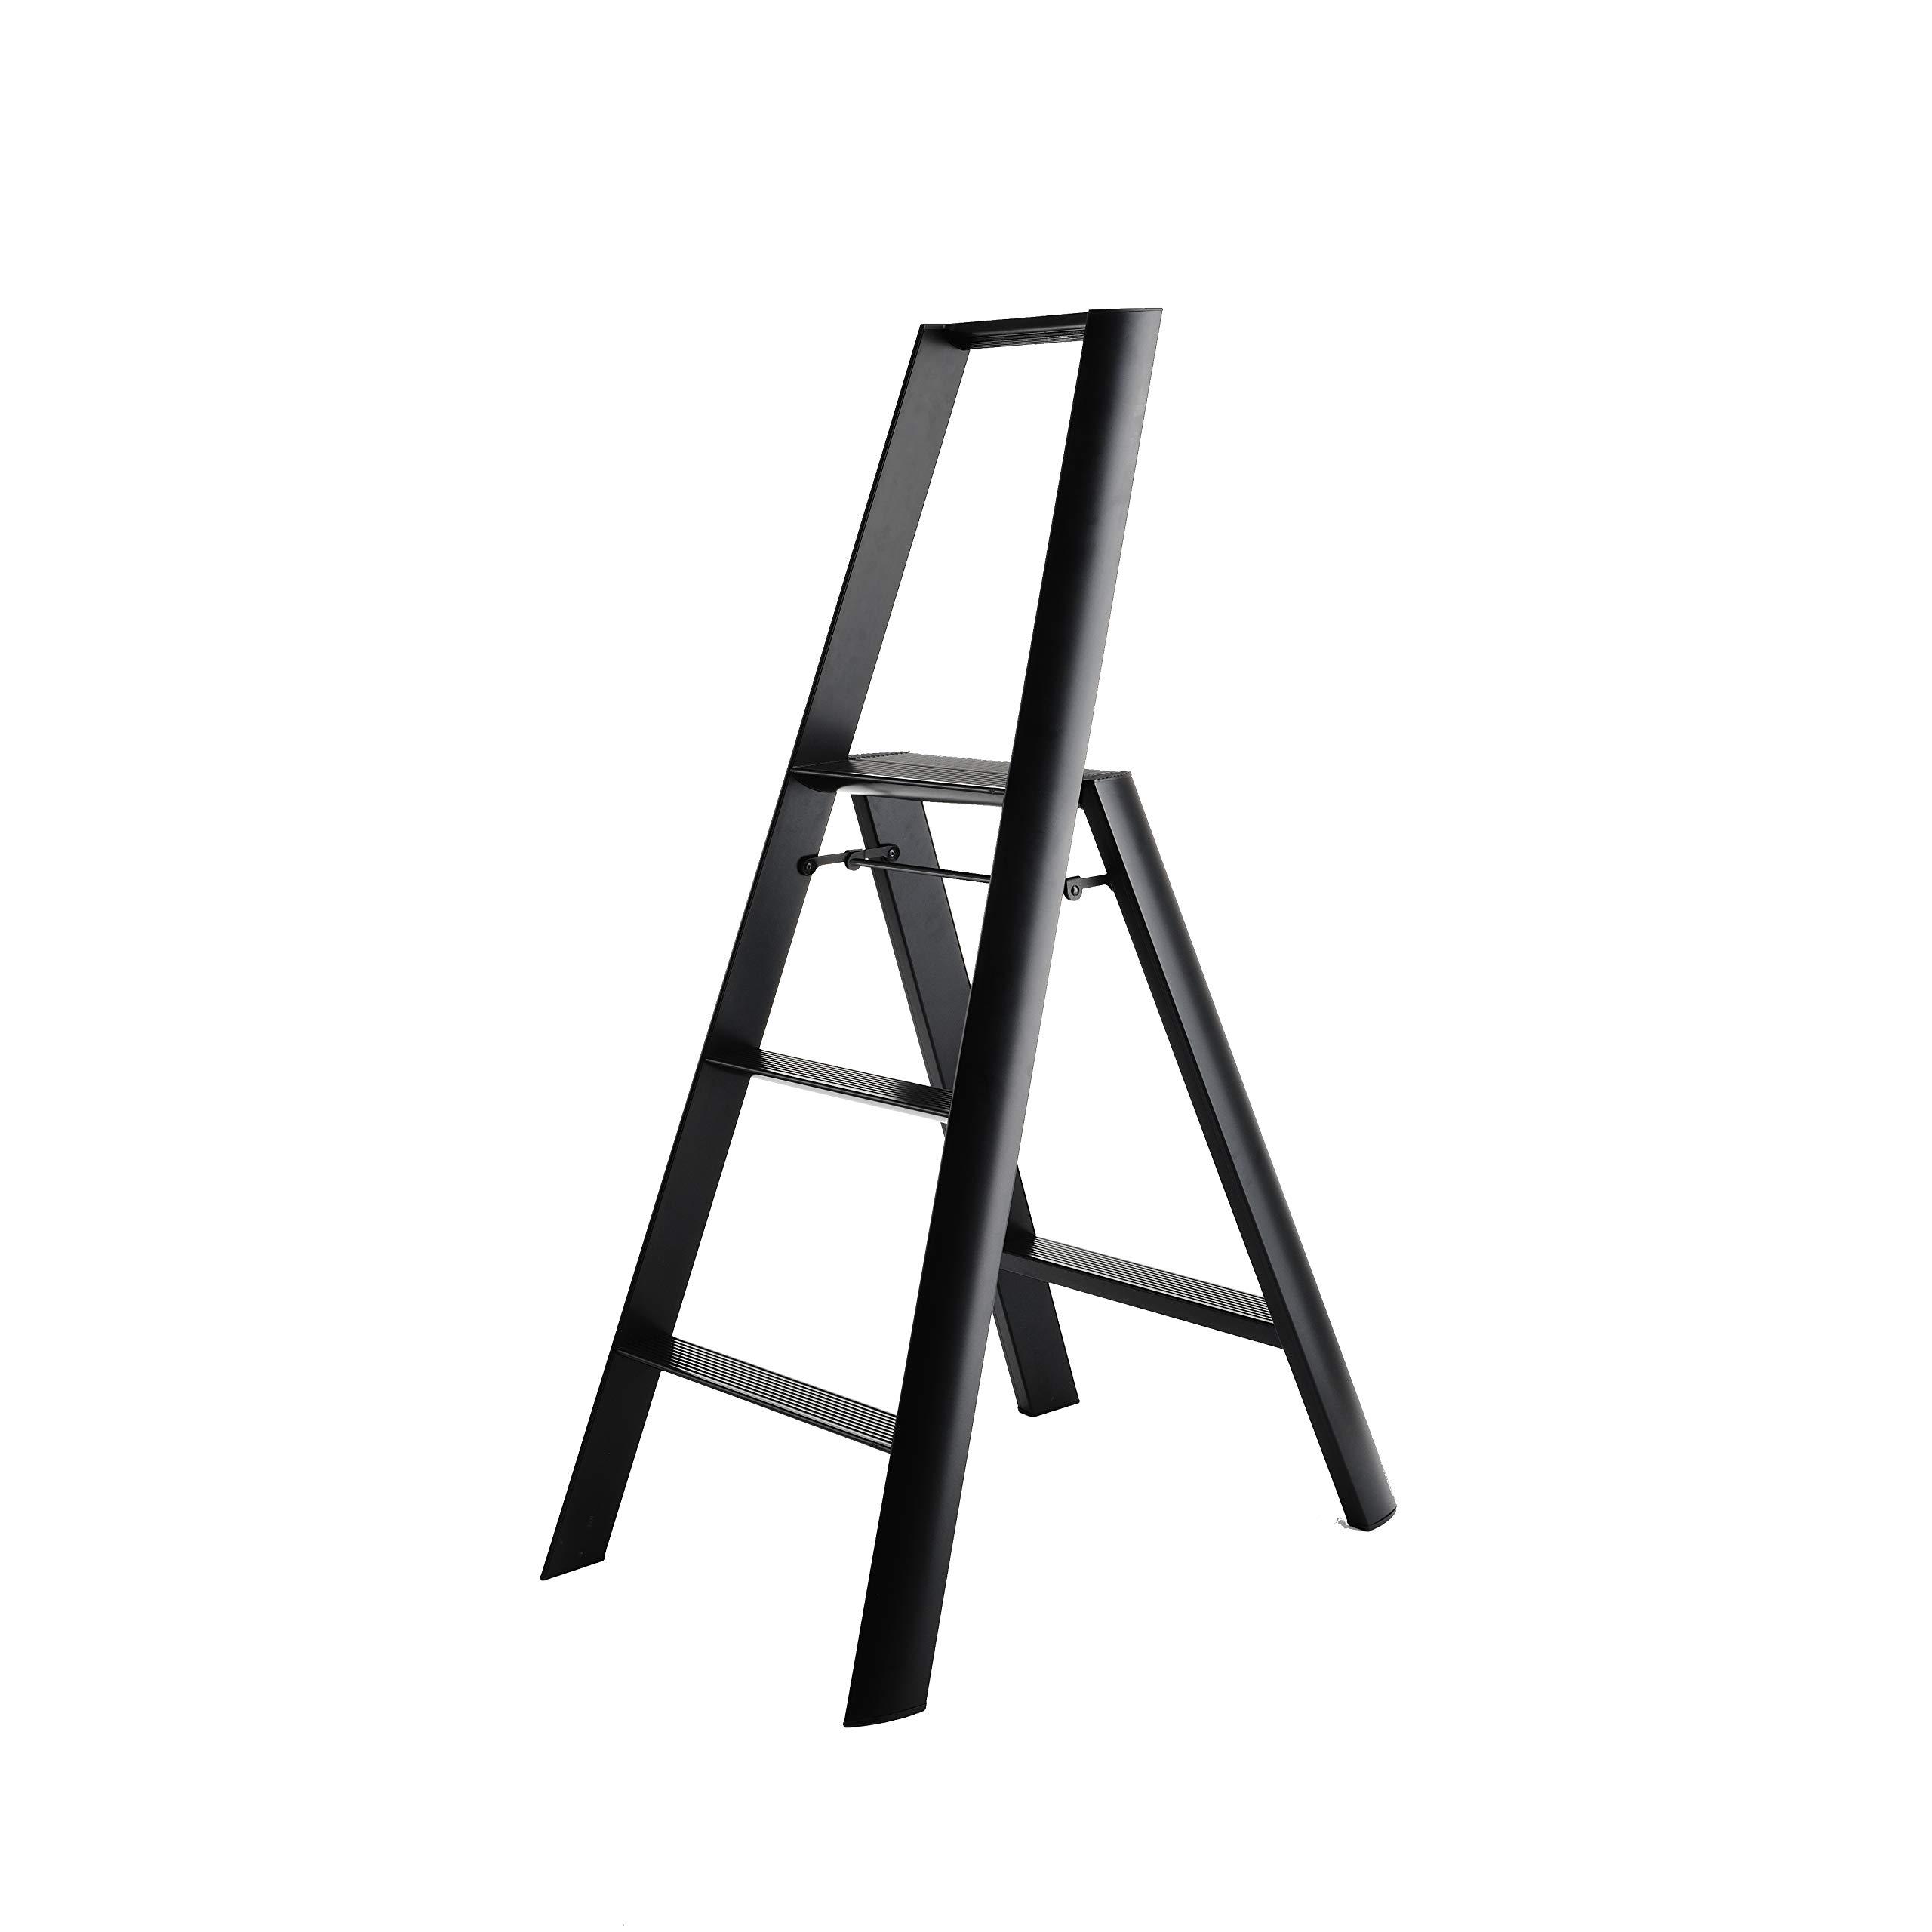 Hasegawa Ladders  Step Ladder, Black by Hasegawa Ladders